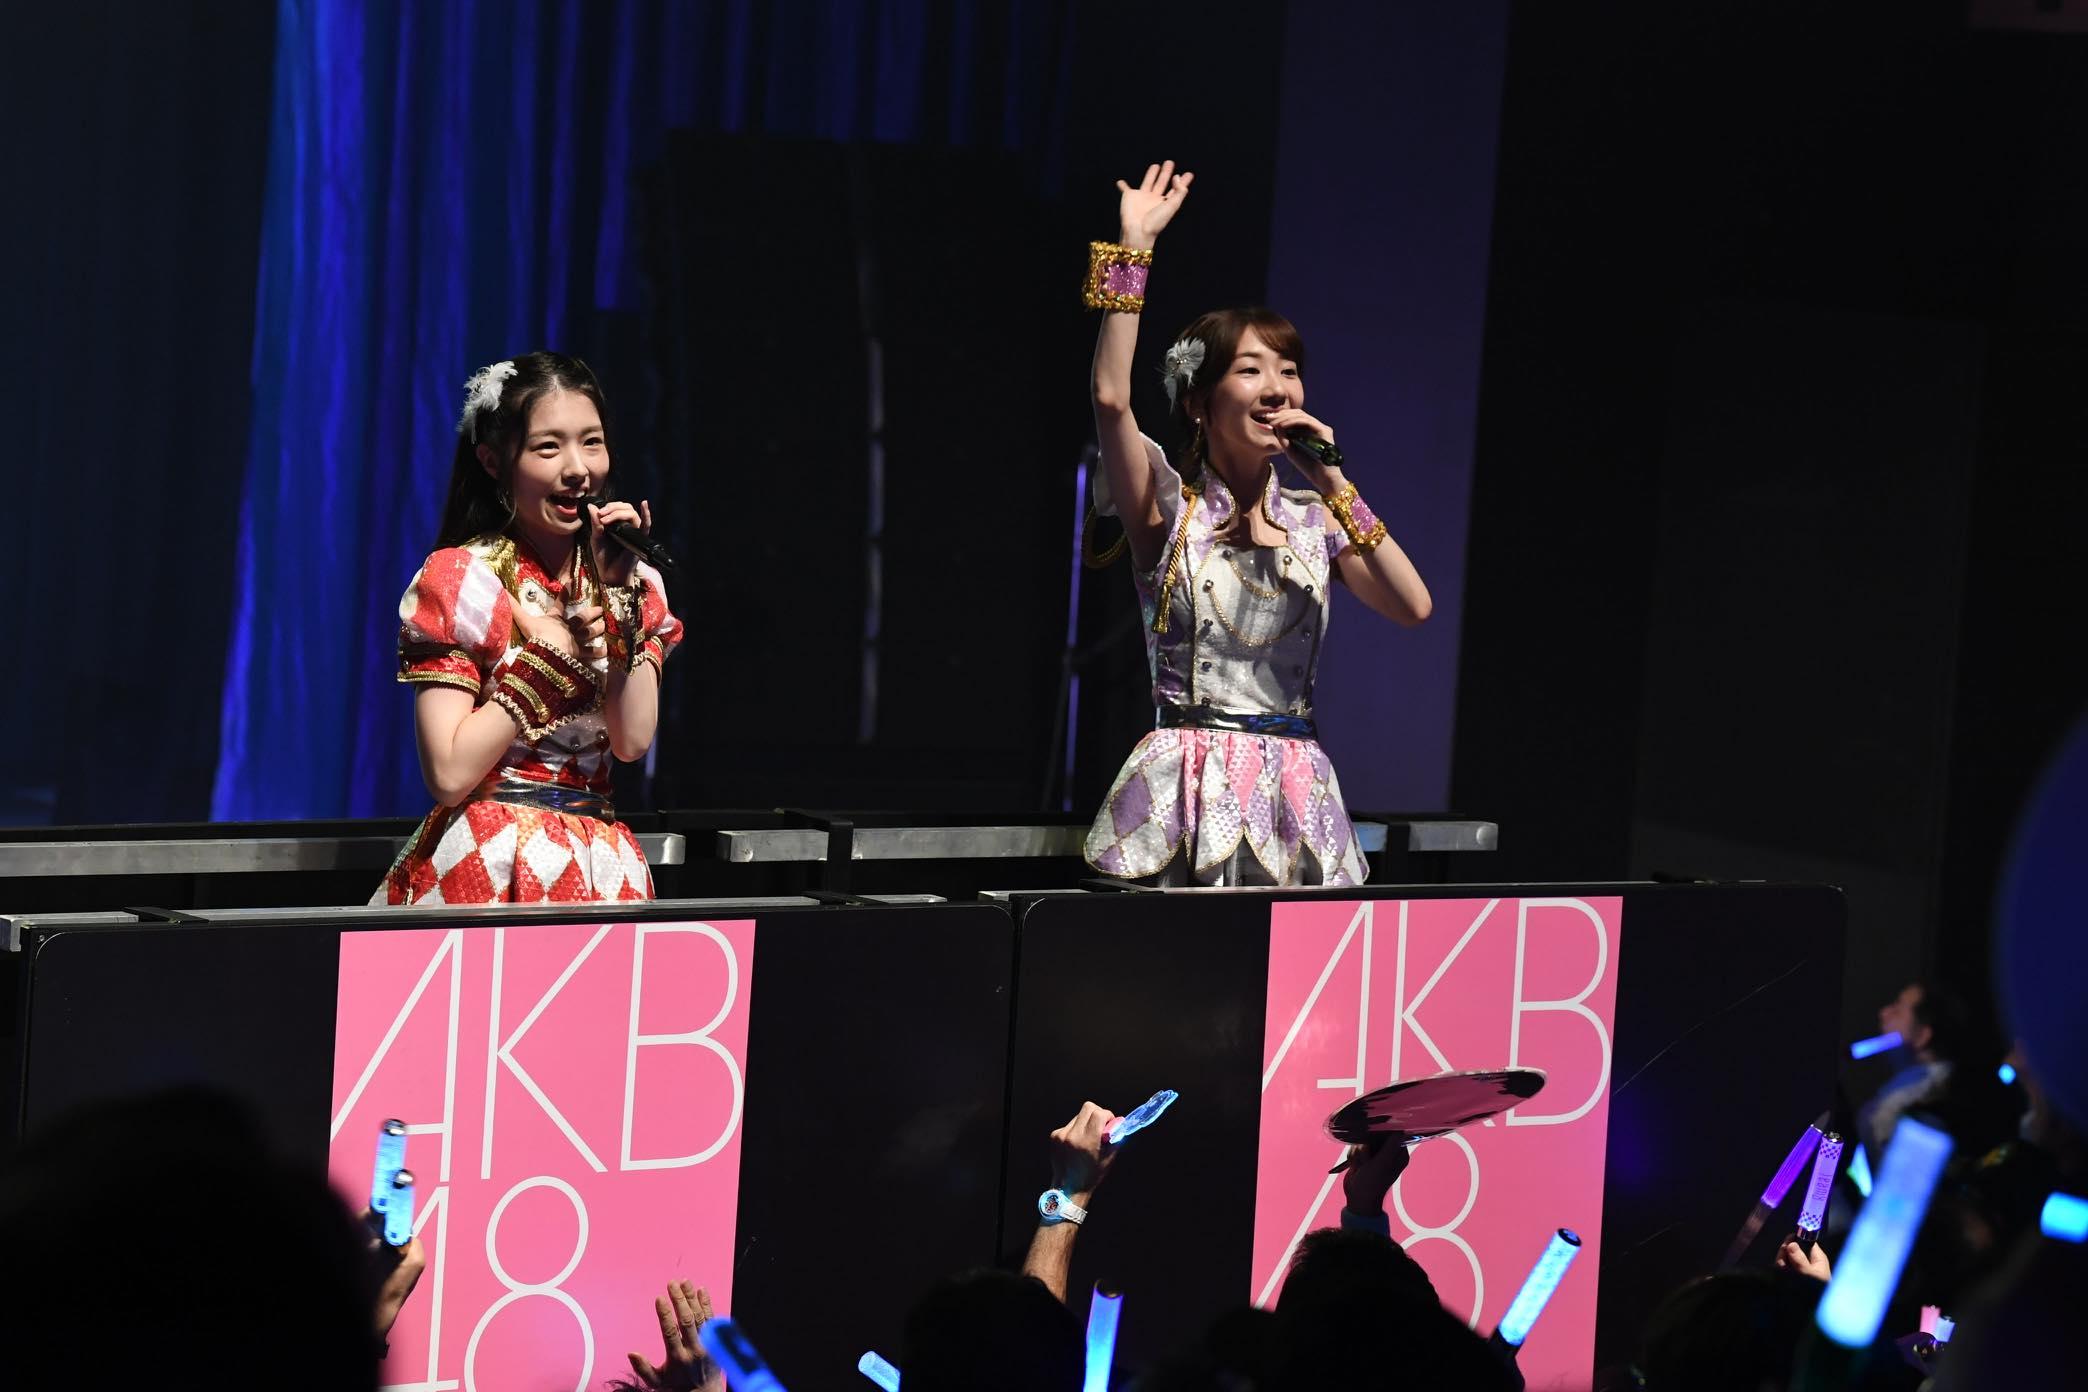 AKB48全国ツアー「神奈川公演」開催、チームBとチーム4のパワーが炸裂!【写真17枚】の画像002